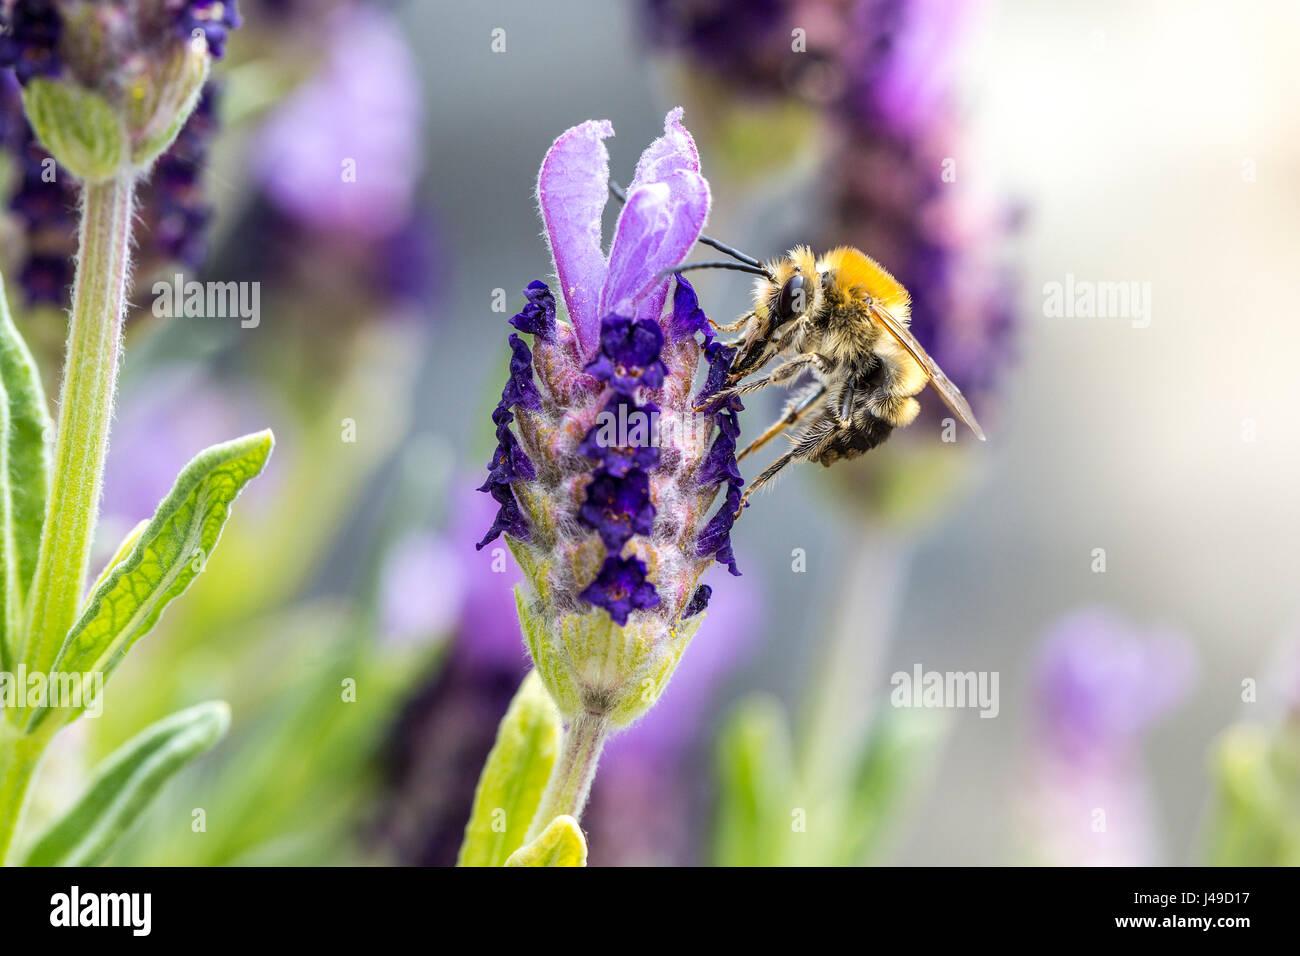 Makro einer Biene bestäuben Lavendelblüten Stockbild